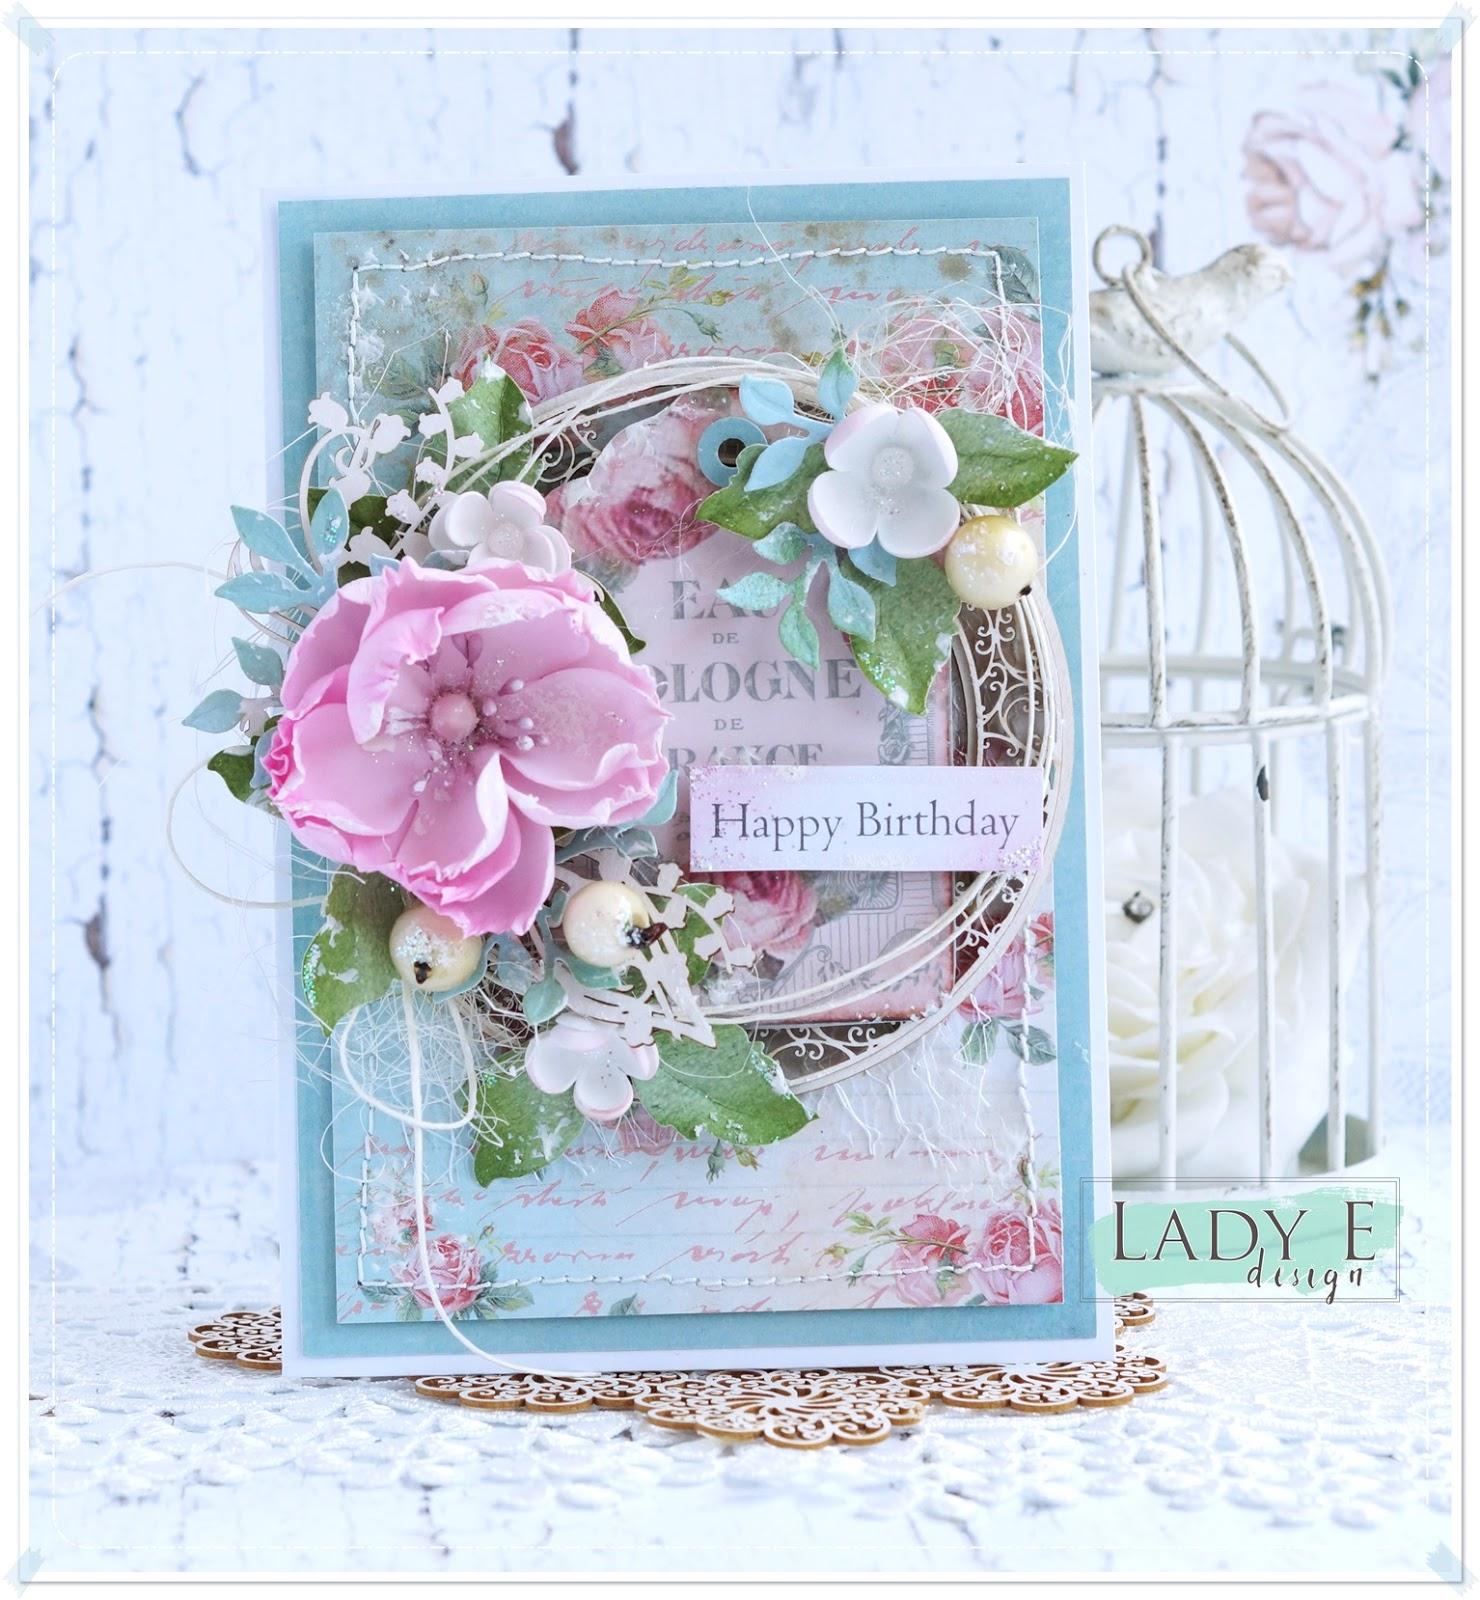 Birthday card with pink foamiran flower scrap art by lady e birthday card with pink foamiran flower izmirmasajfo